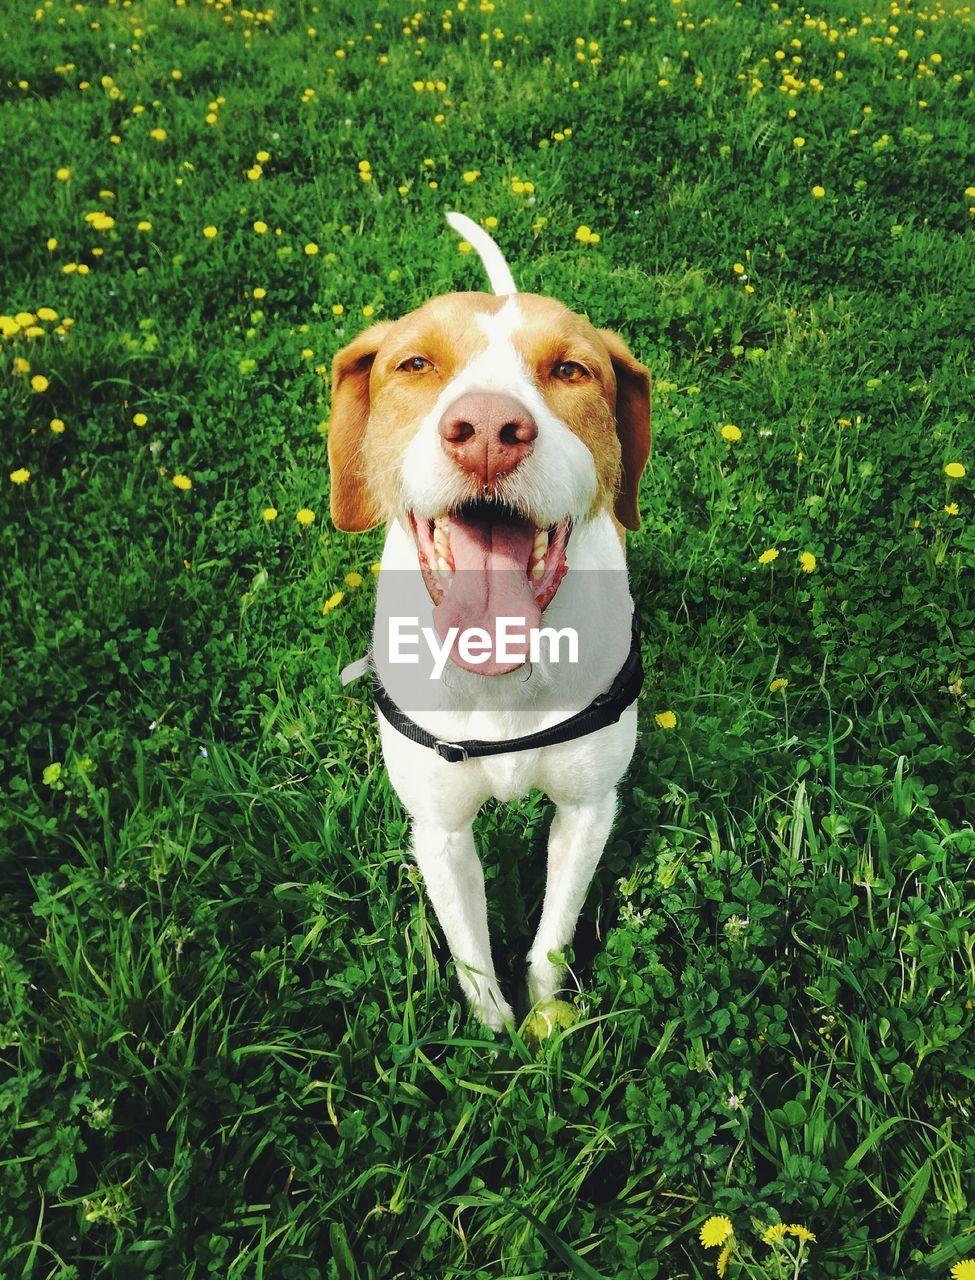 Cute dog on field